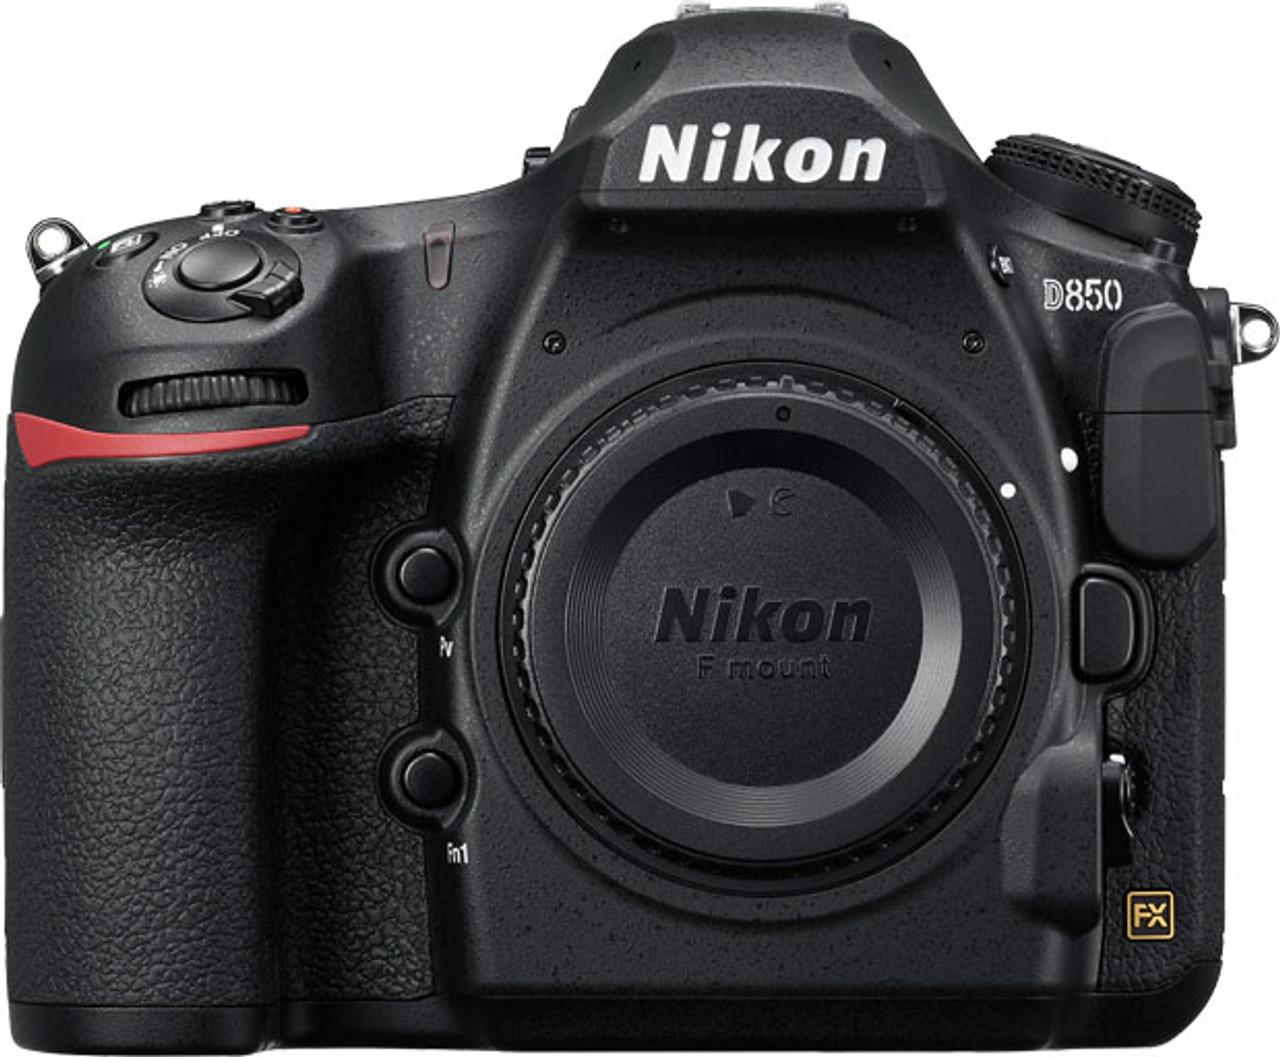 Nikon D850 DSLR Camera - Body Only - Black